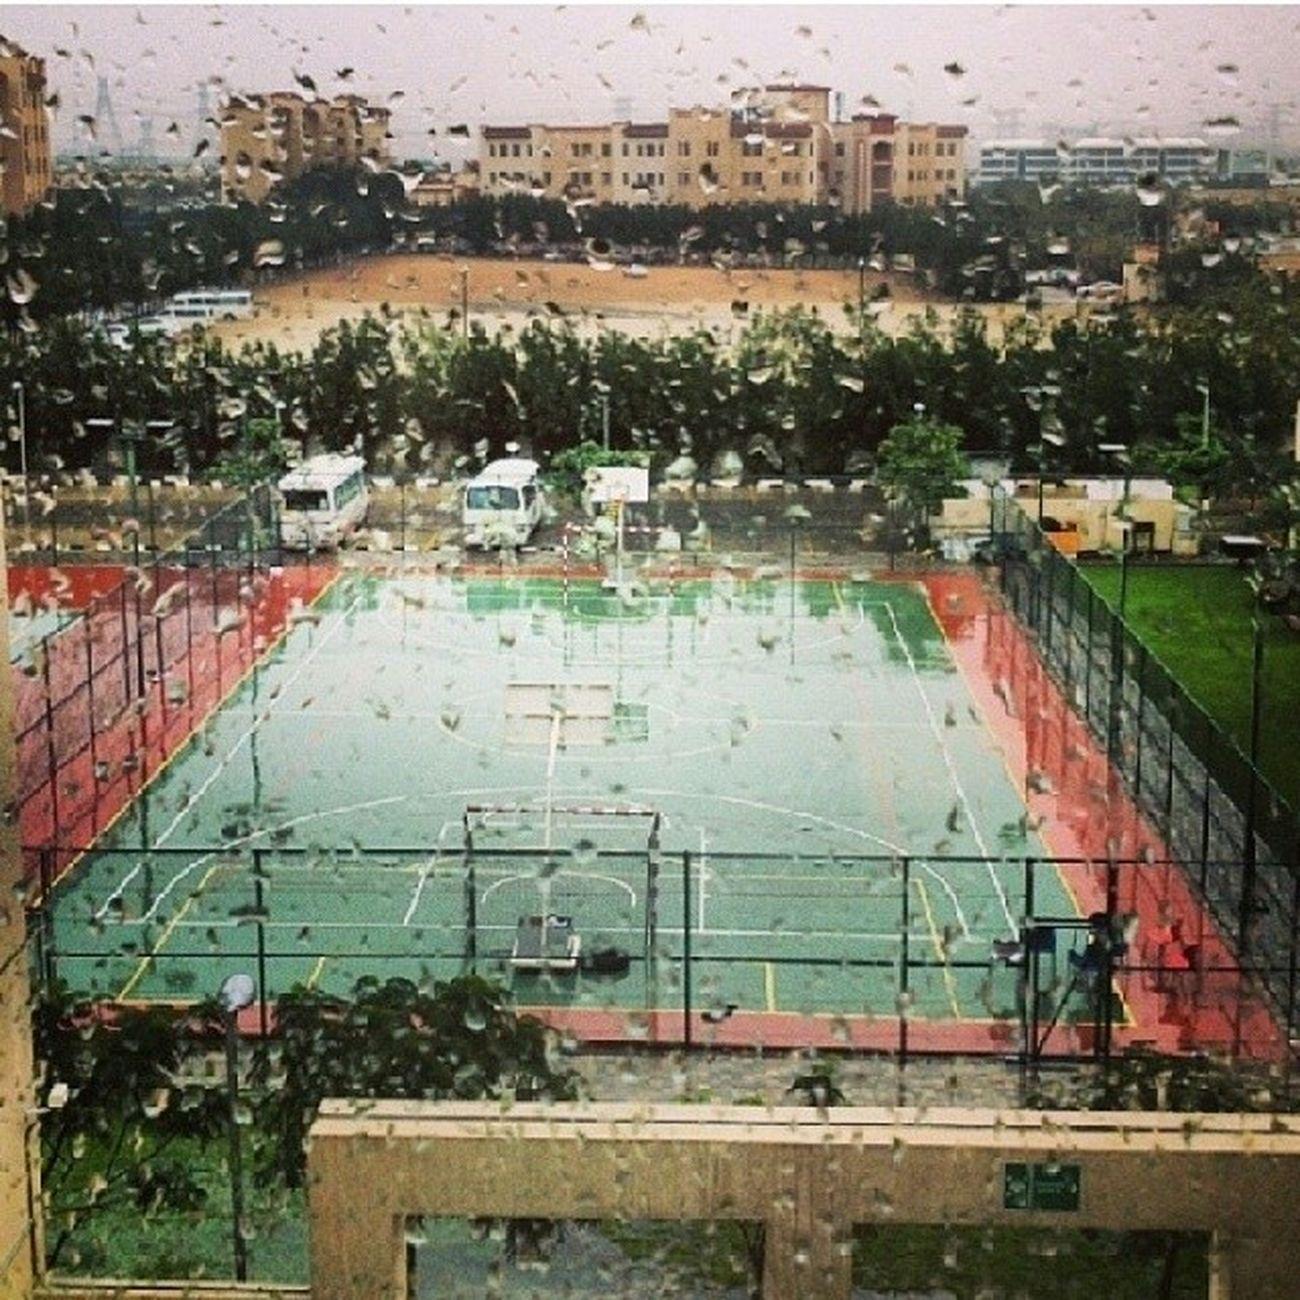 MyUniversity Duringrain Hwudc Dubai gonnamissthis Regram @bhanulakhwani